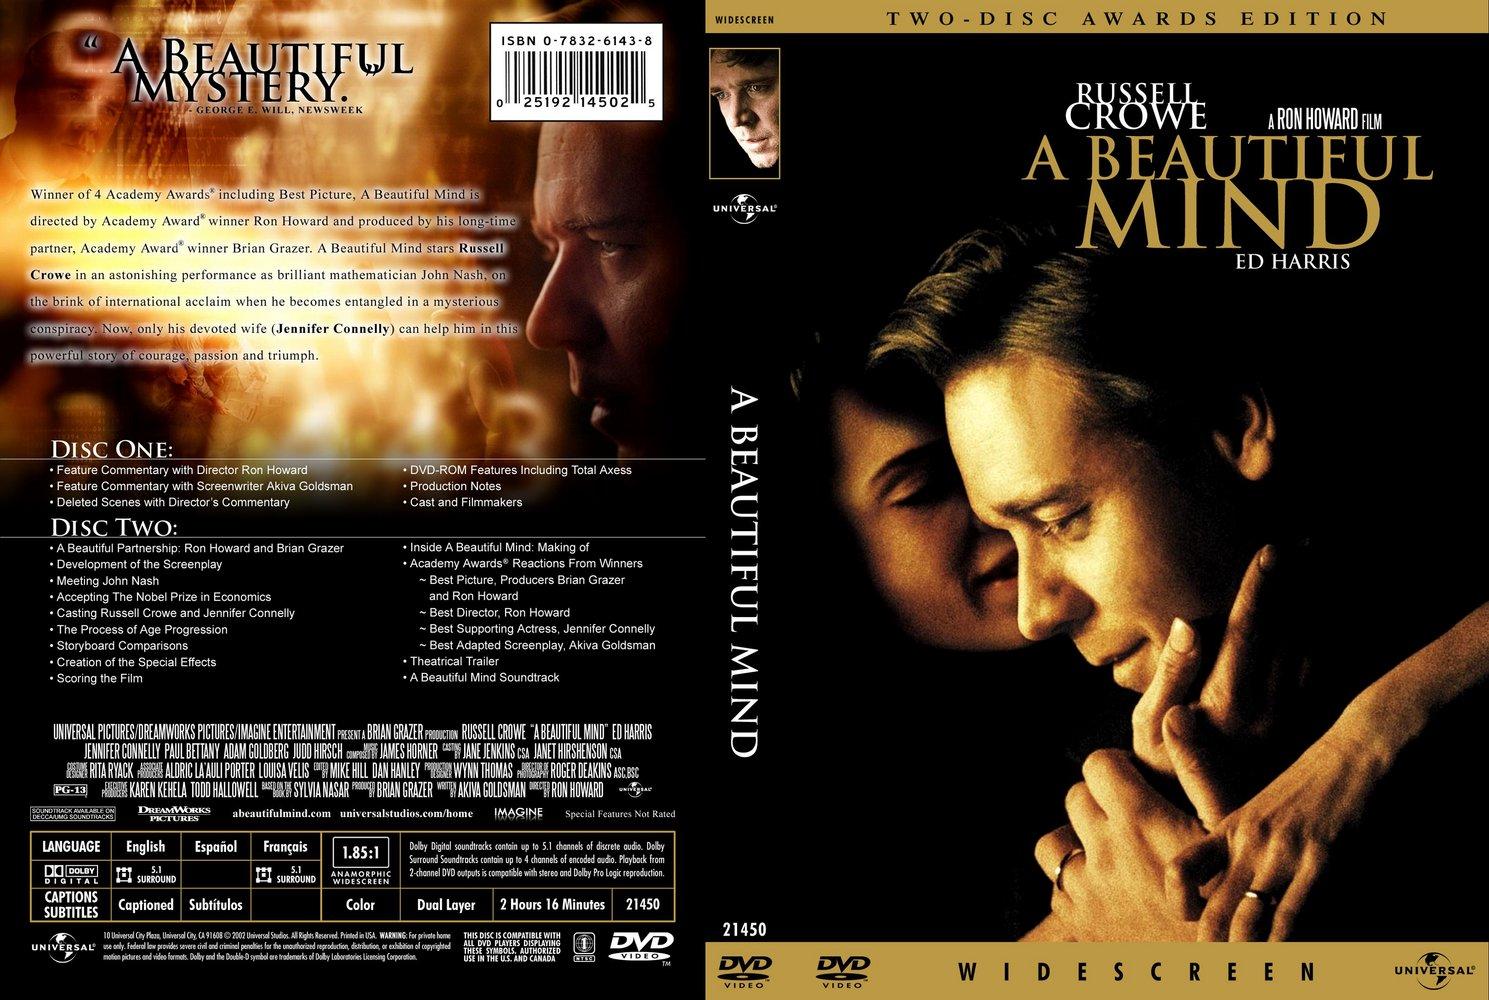 A Beautiful Mind 2001 WS SE R1 amp R4  Movie DVD  CD